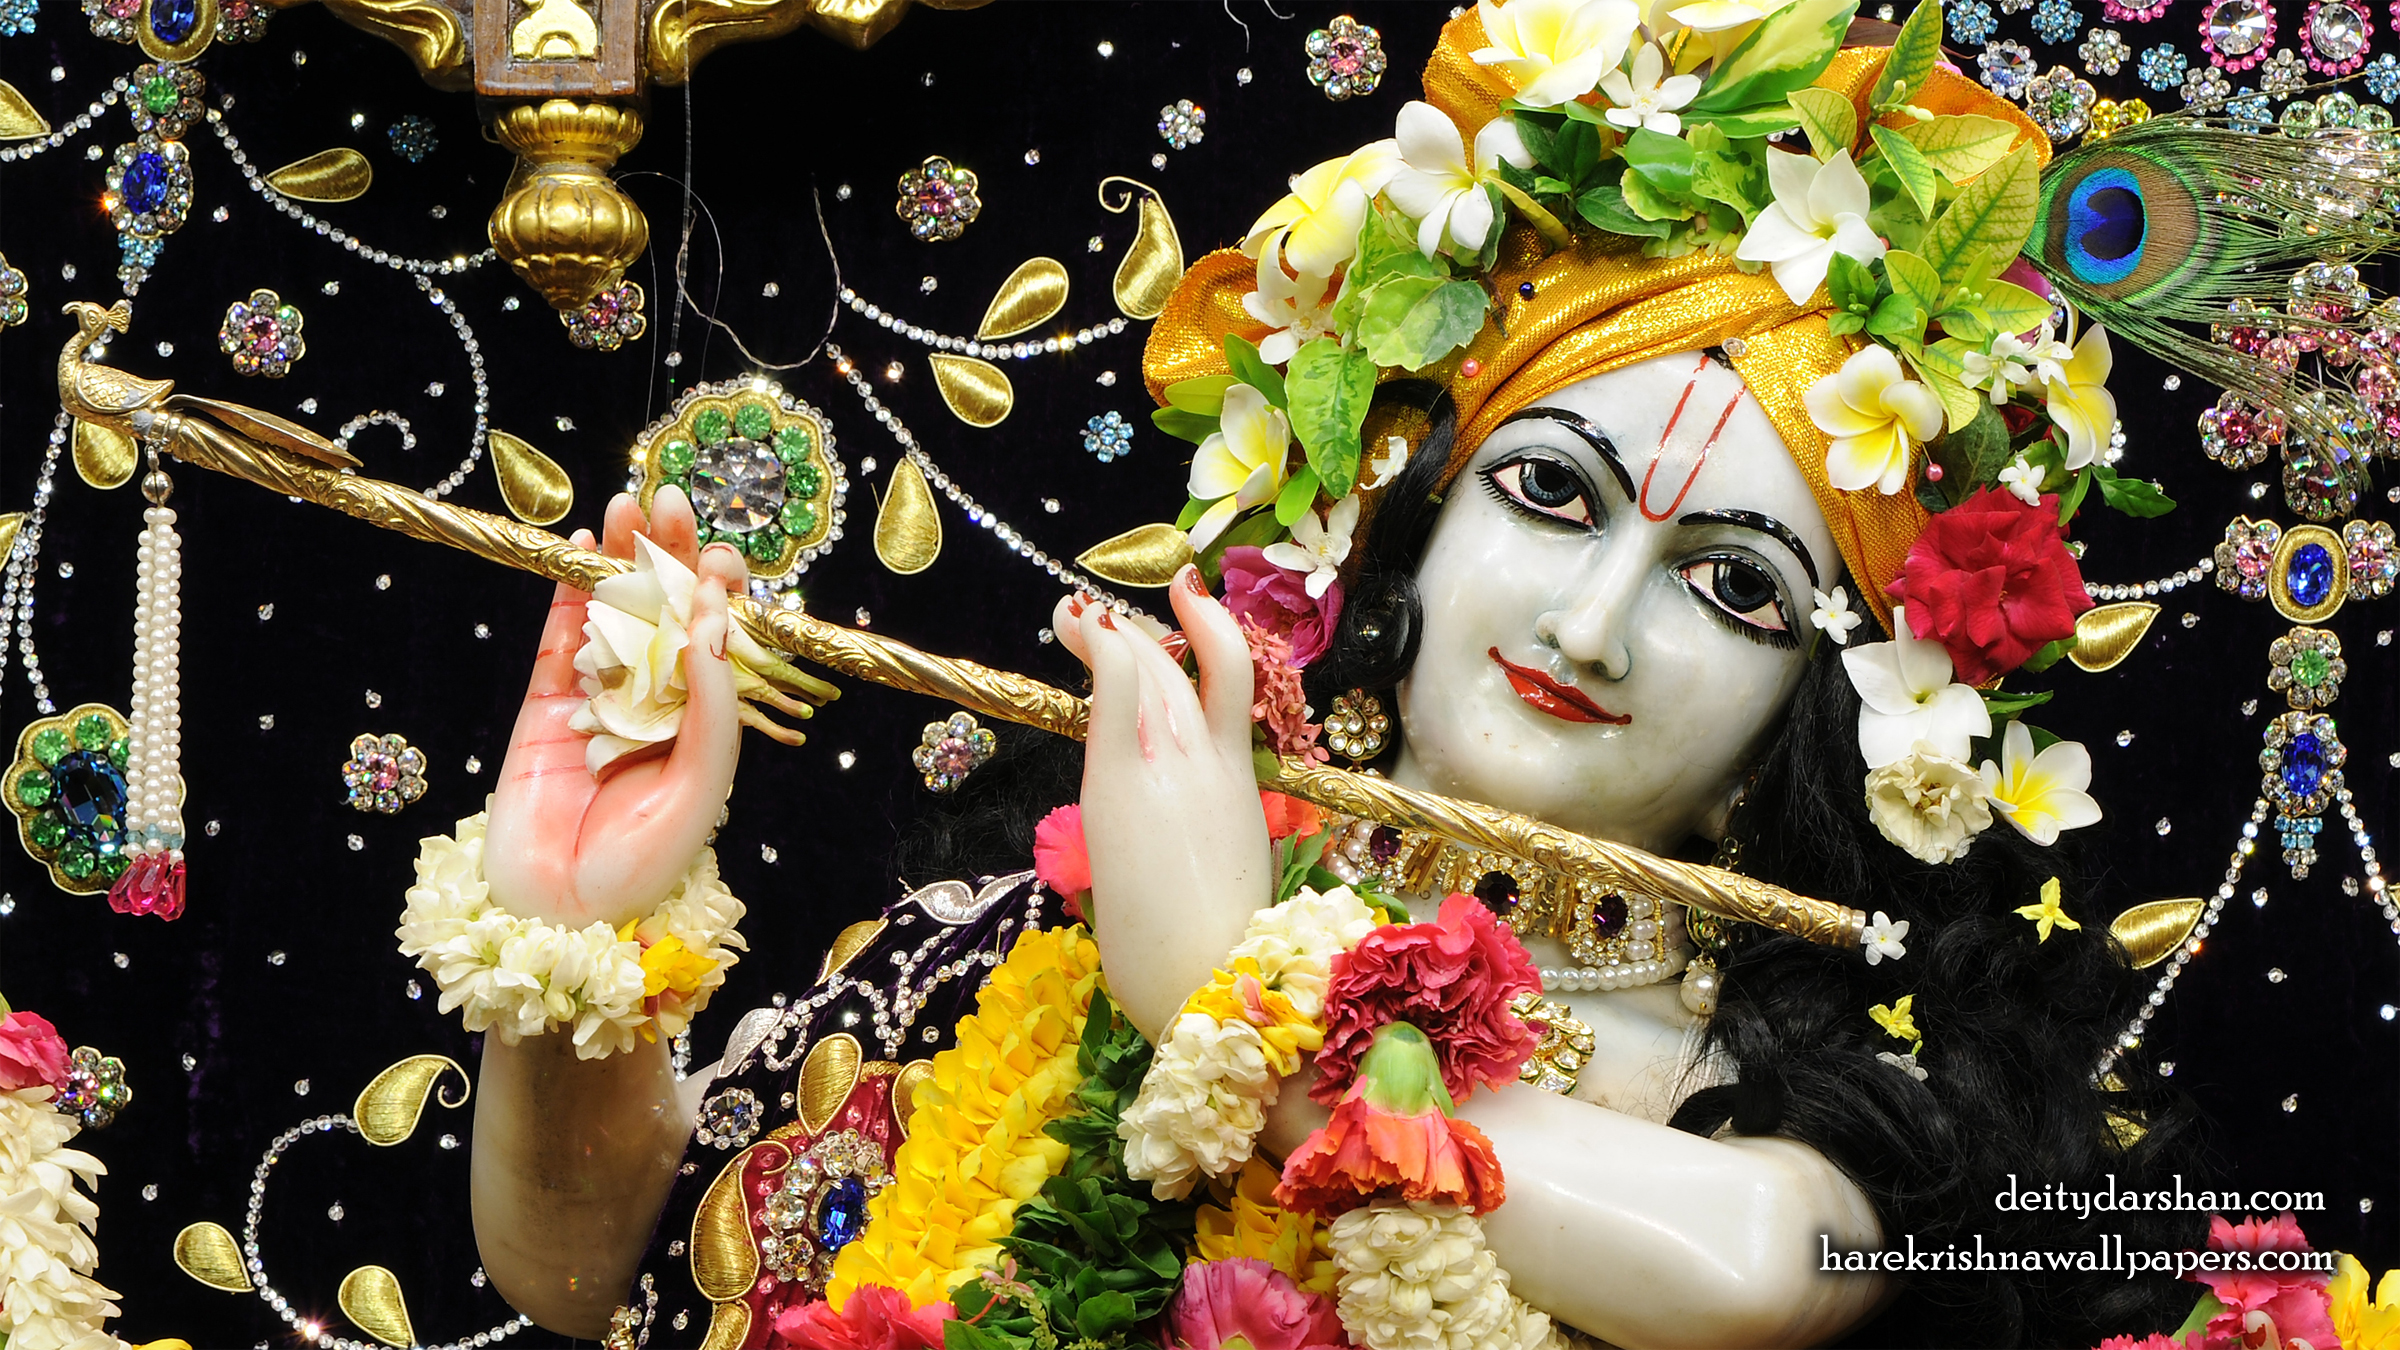 Sri Gopinath Close up Wallpaper (149) Size 2400x1350 Download